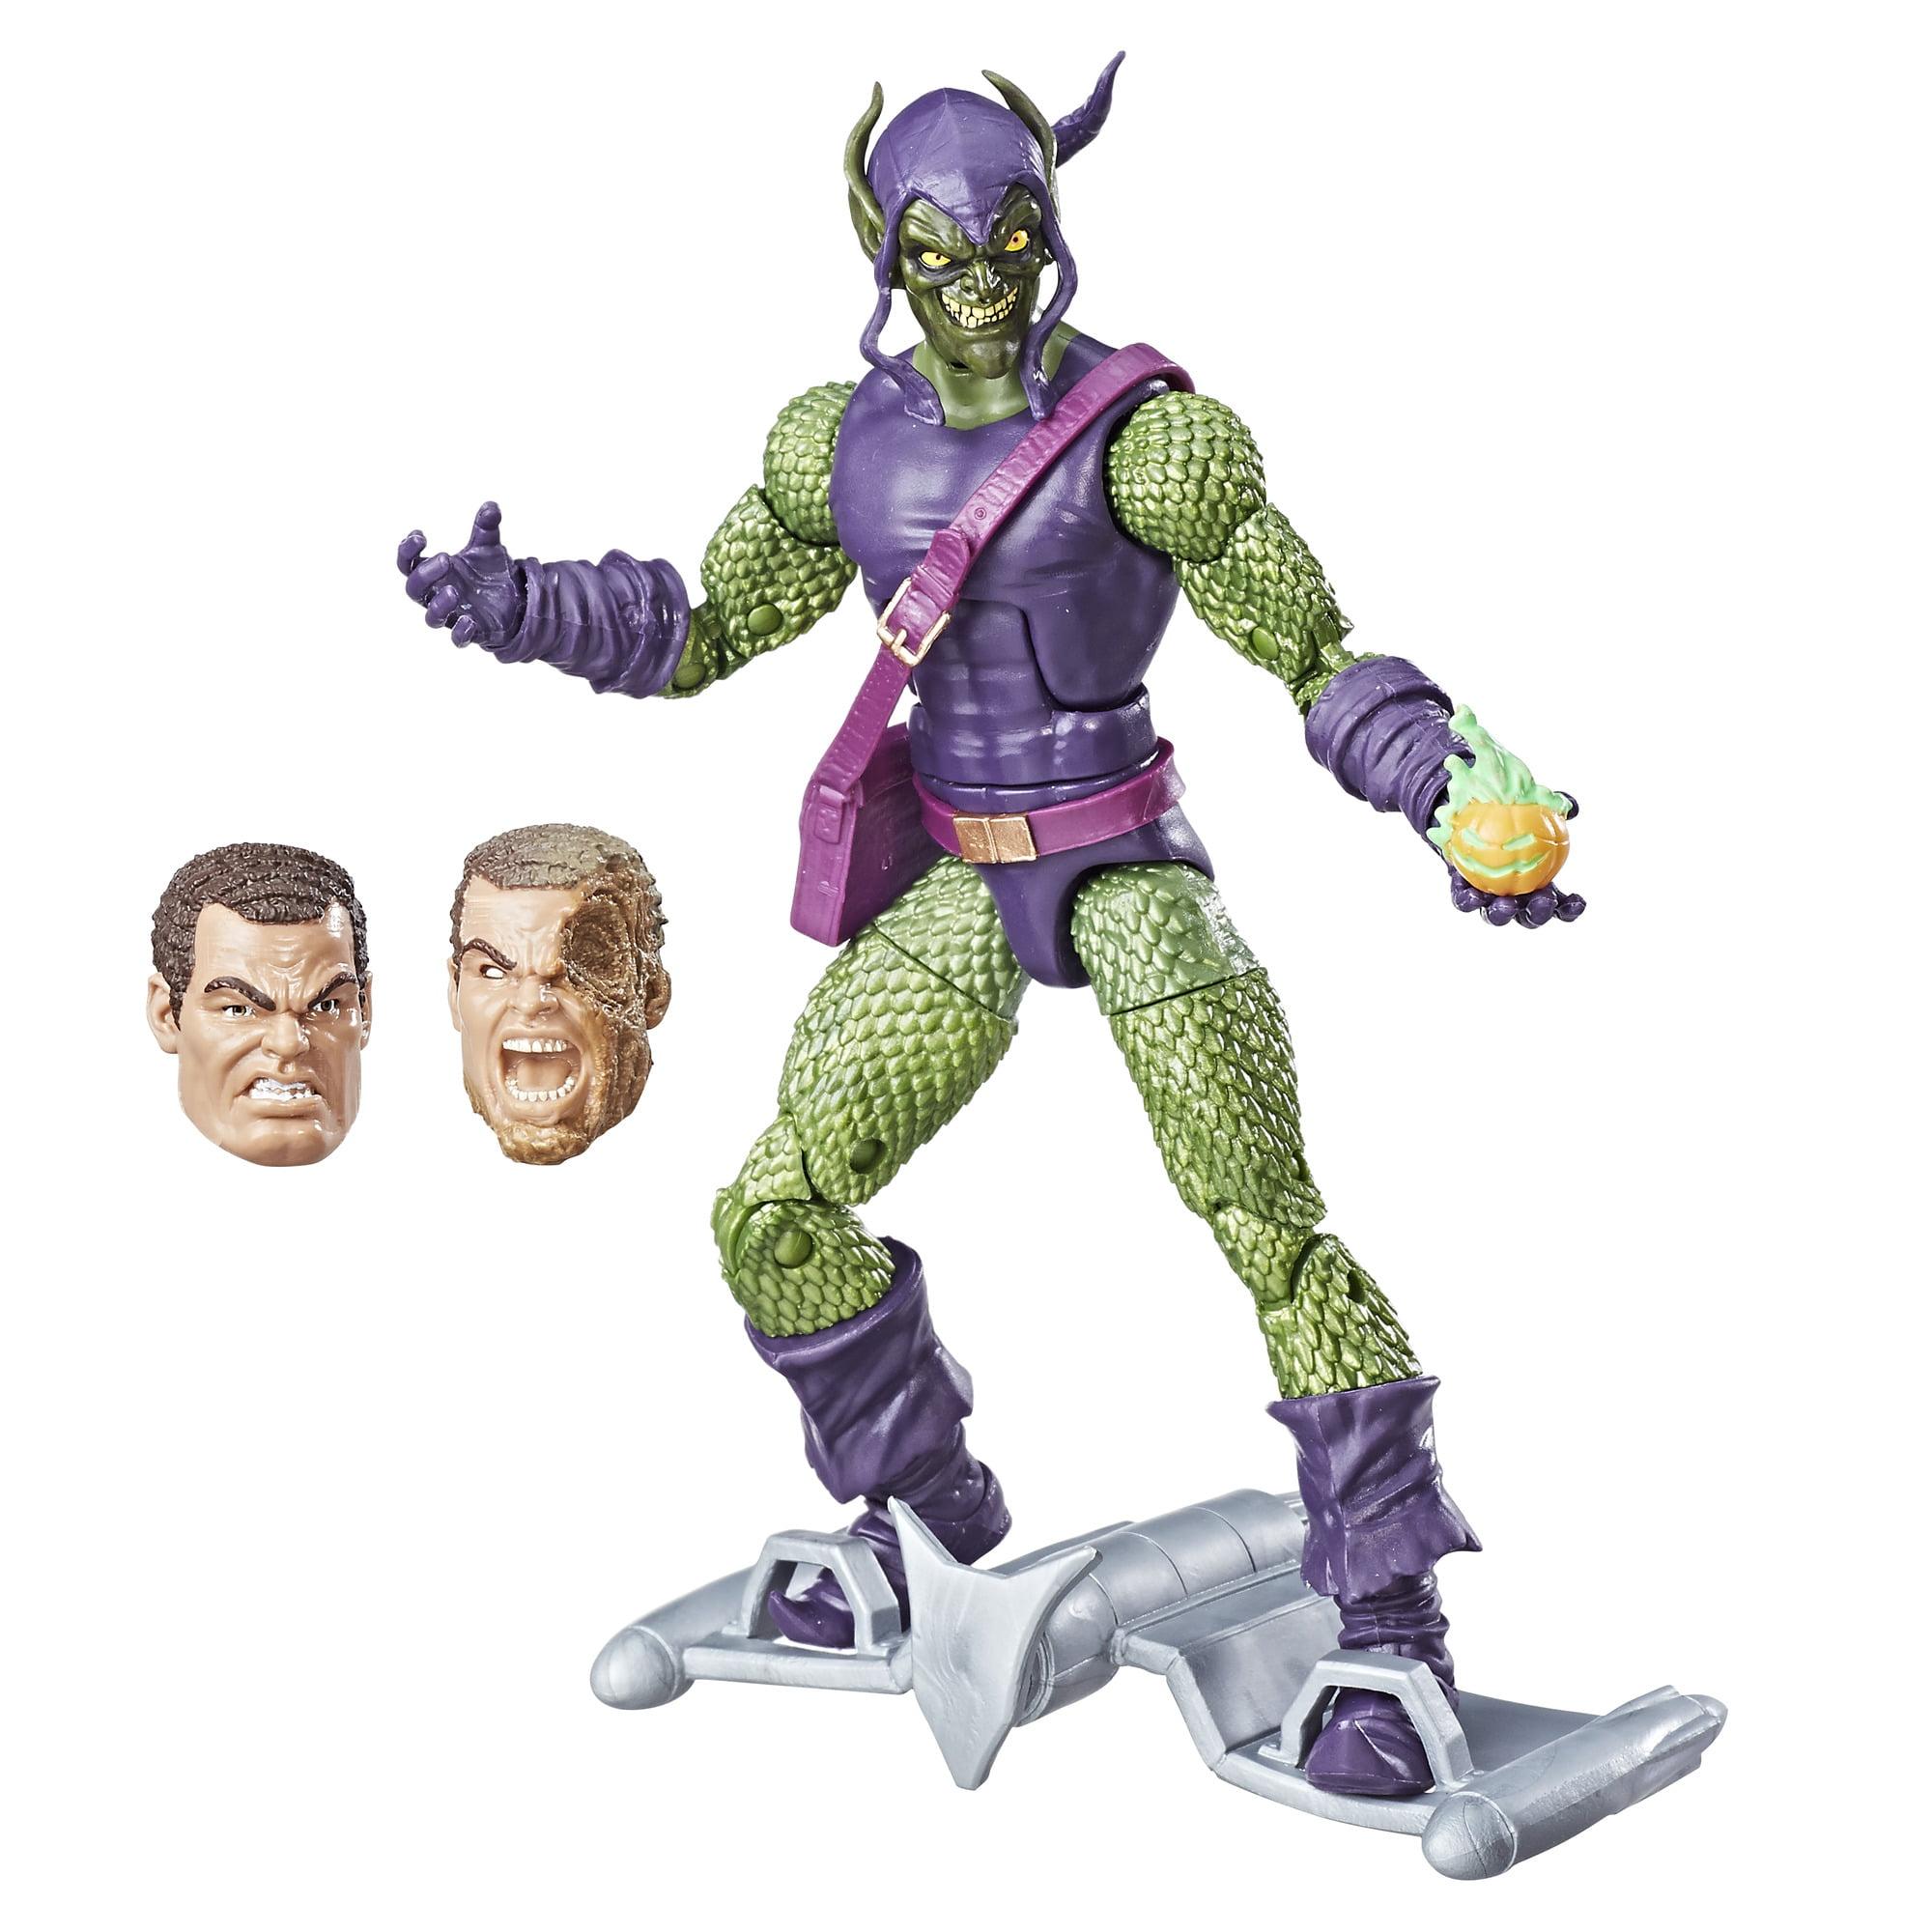 Marvel Spider-Man 6-inch Legends Series Green Goblin by Hasbro